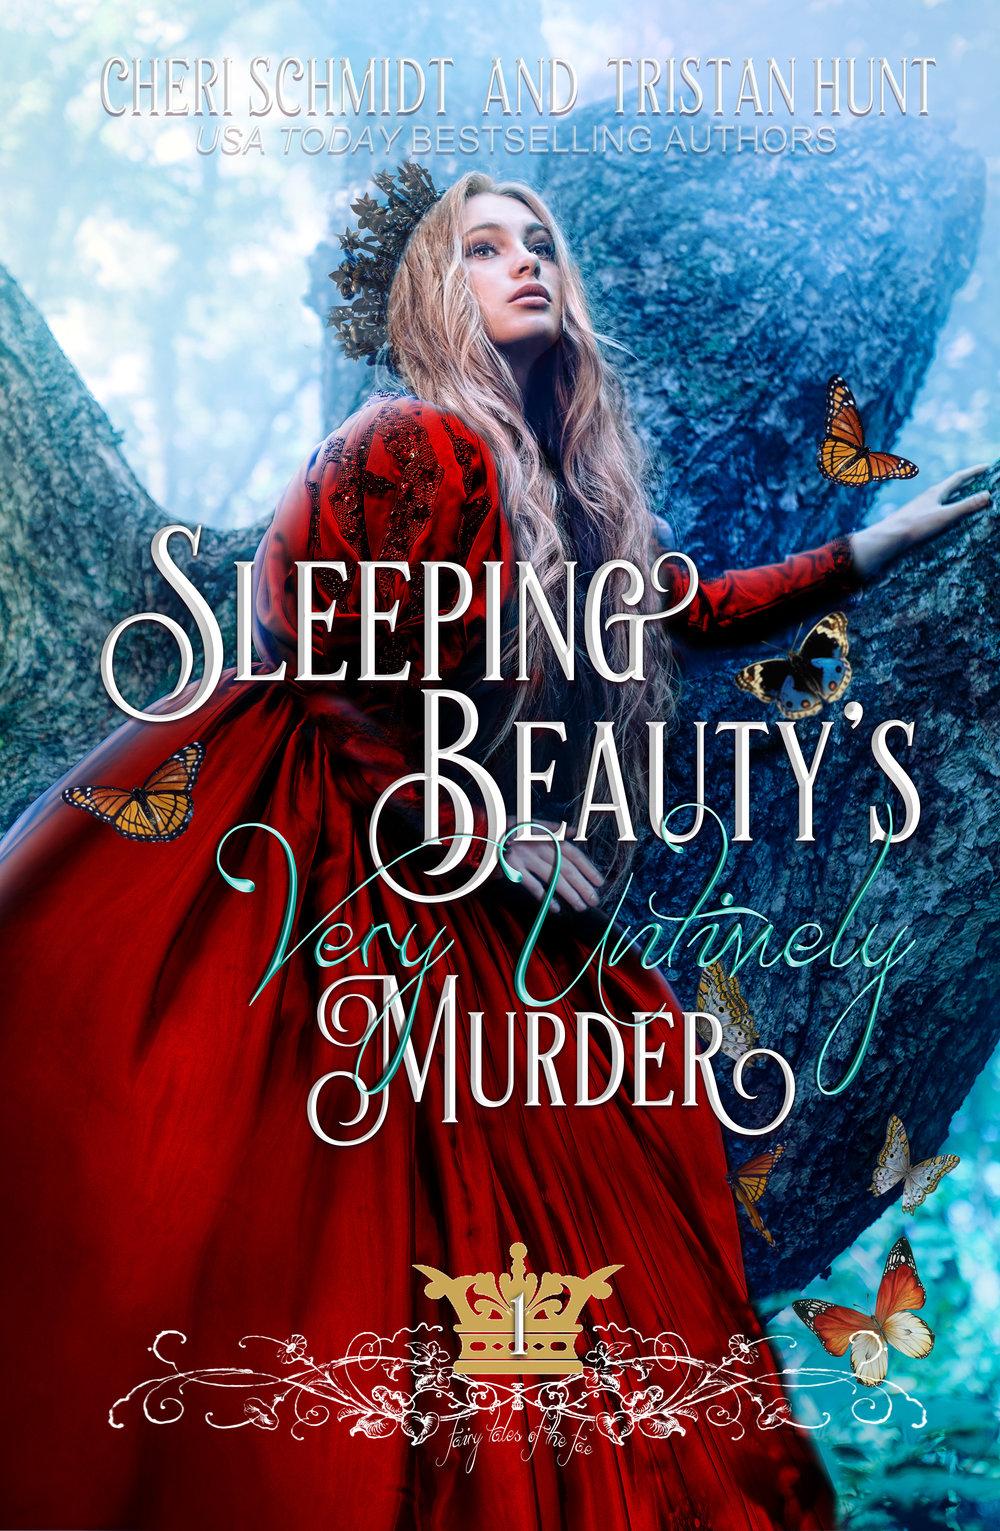 7-23-18 Sleeping Beauty's Untimely Murder-Schmidt and Hunt-final print7-24-18.jpg